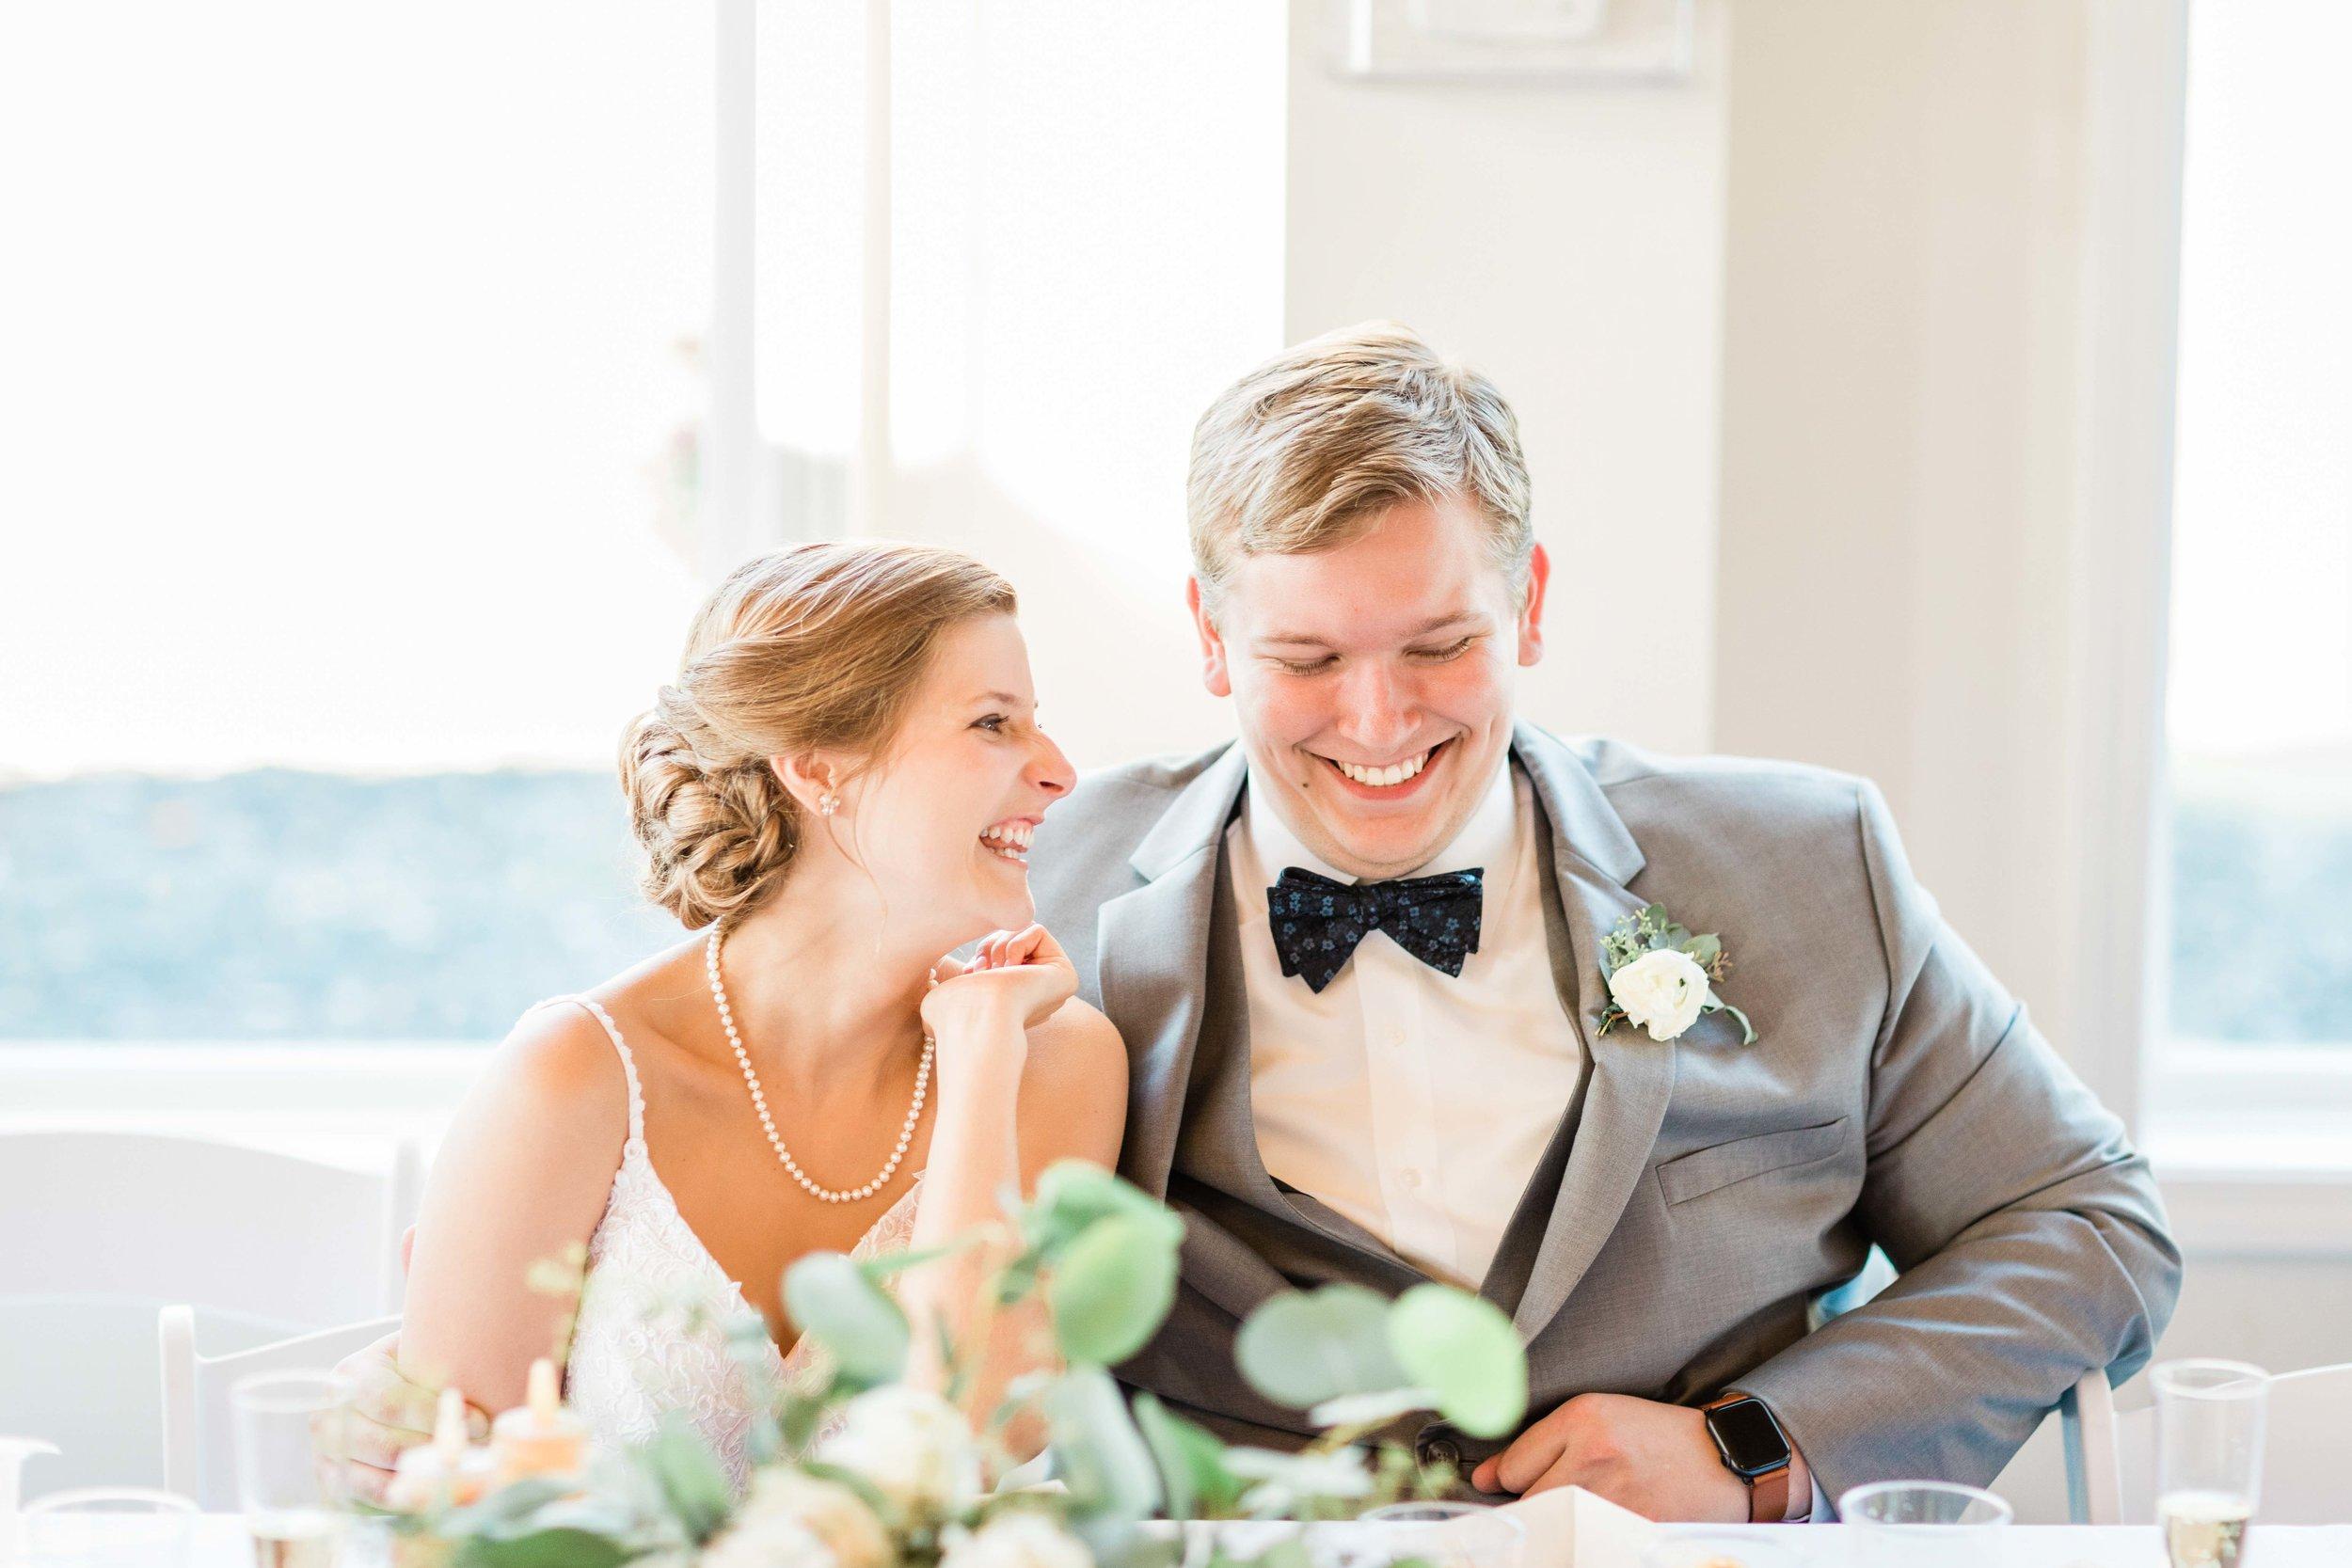 rosewood manor miamisburg wedding photos-3.jpg